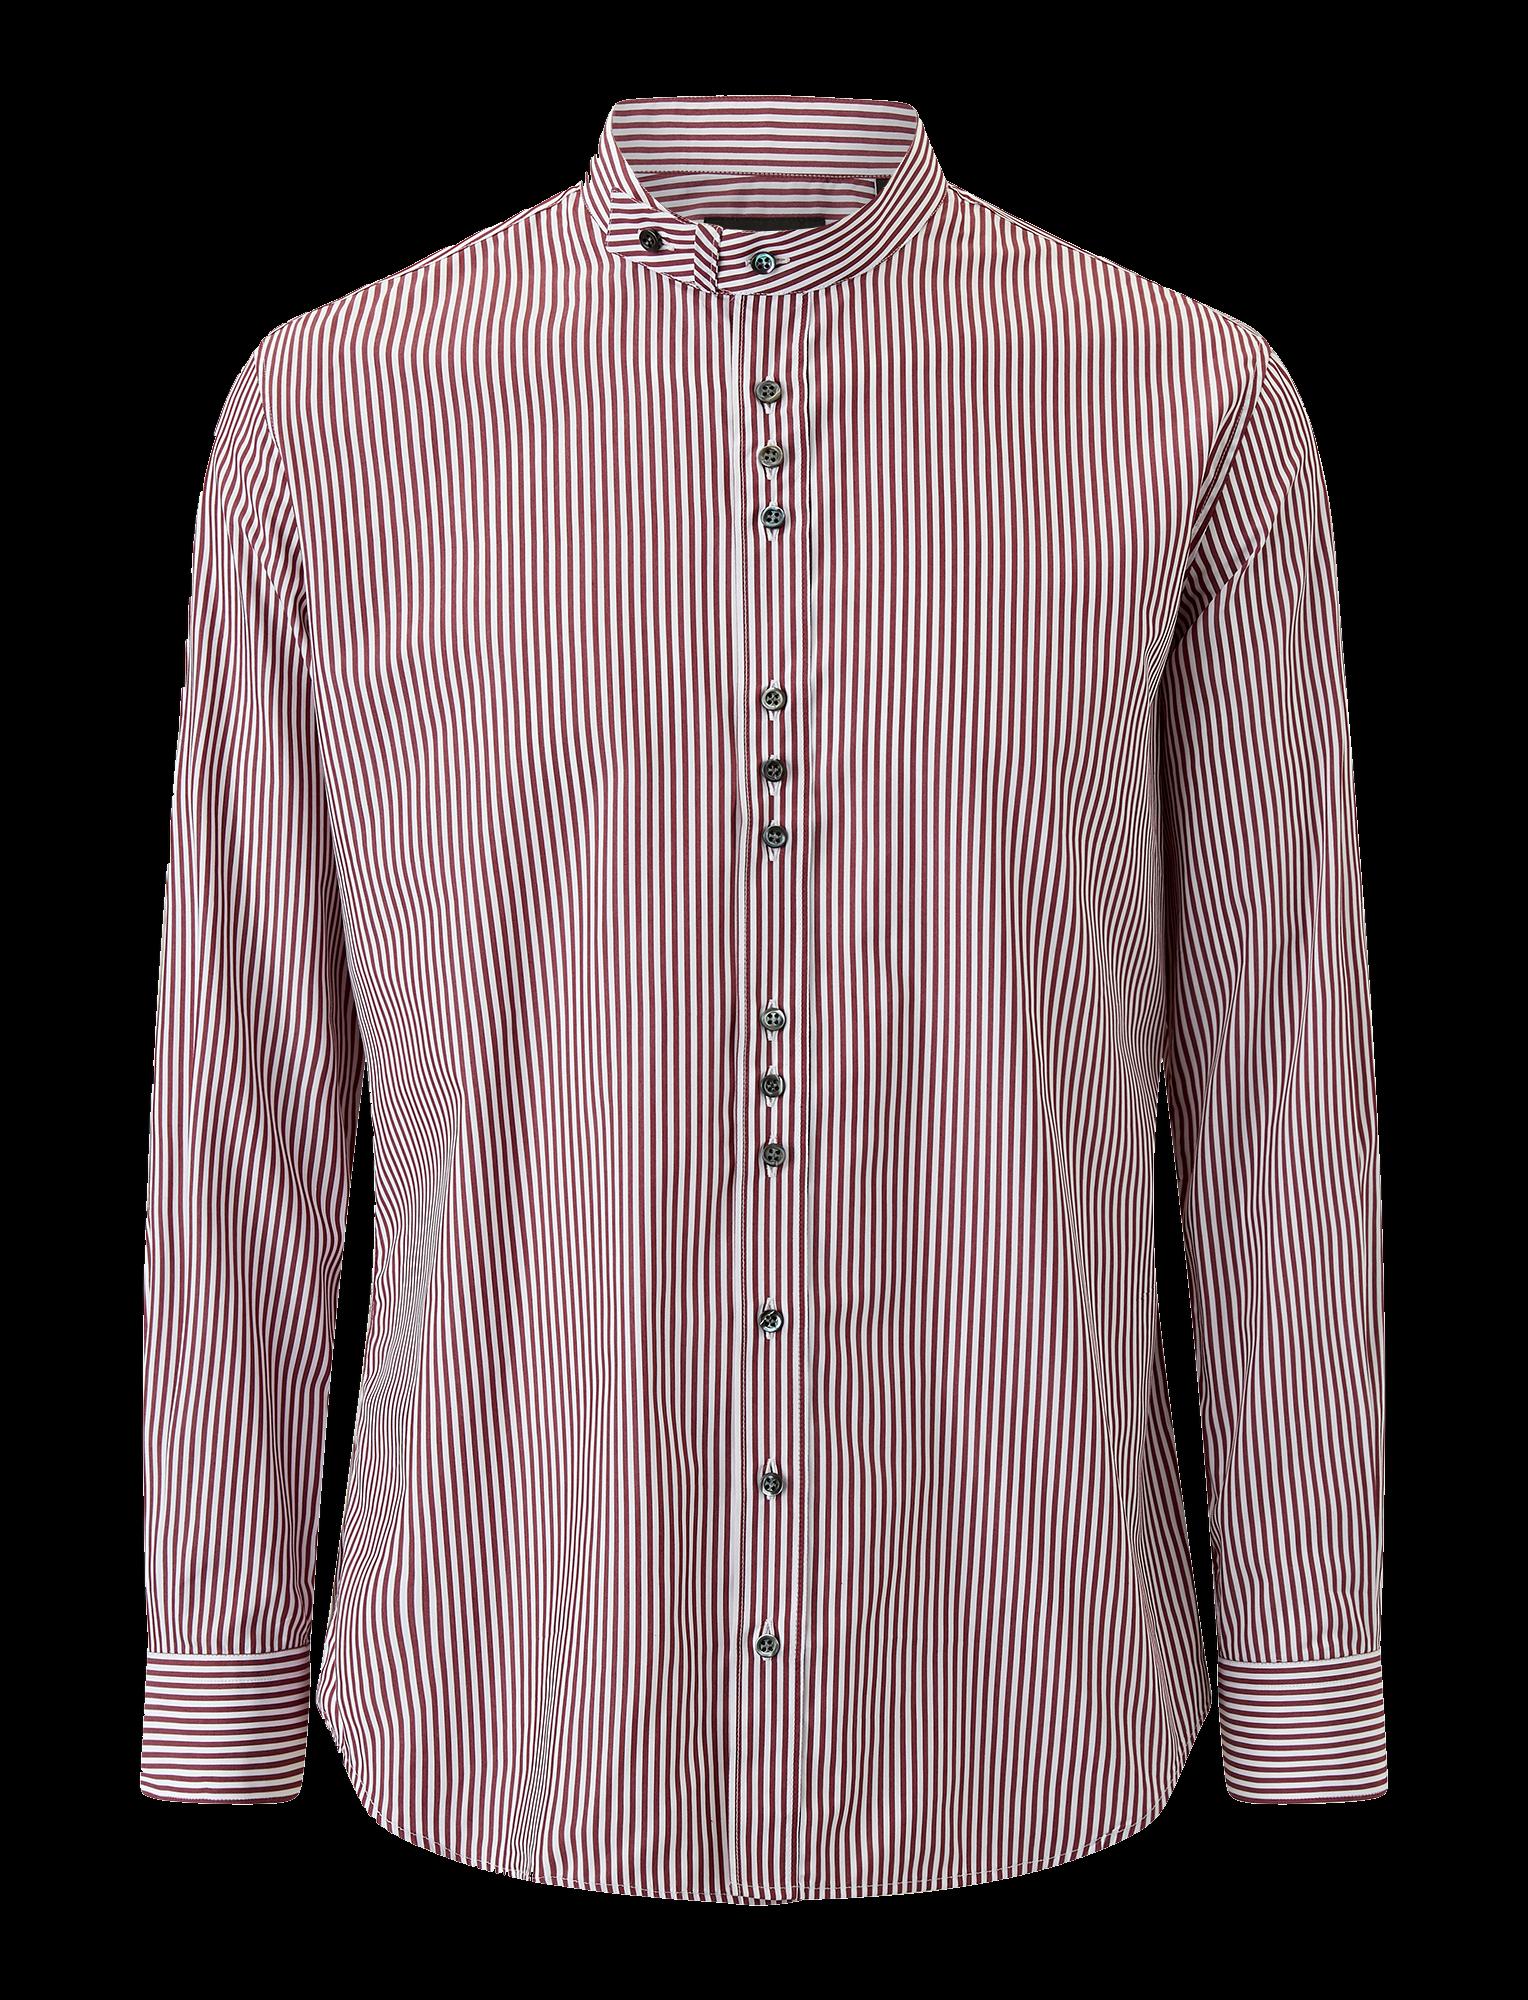 Joseph, Jarvis Cupro Pinstripes Mix Shirts, in GARNET